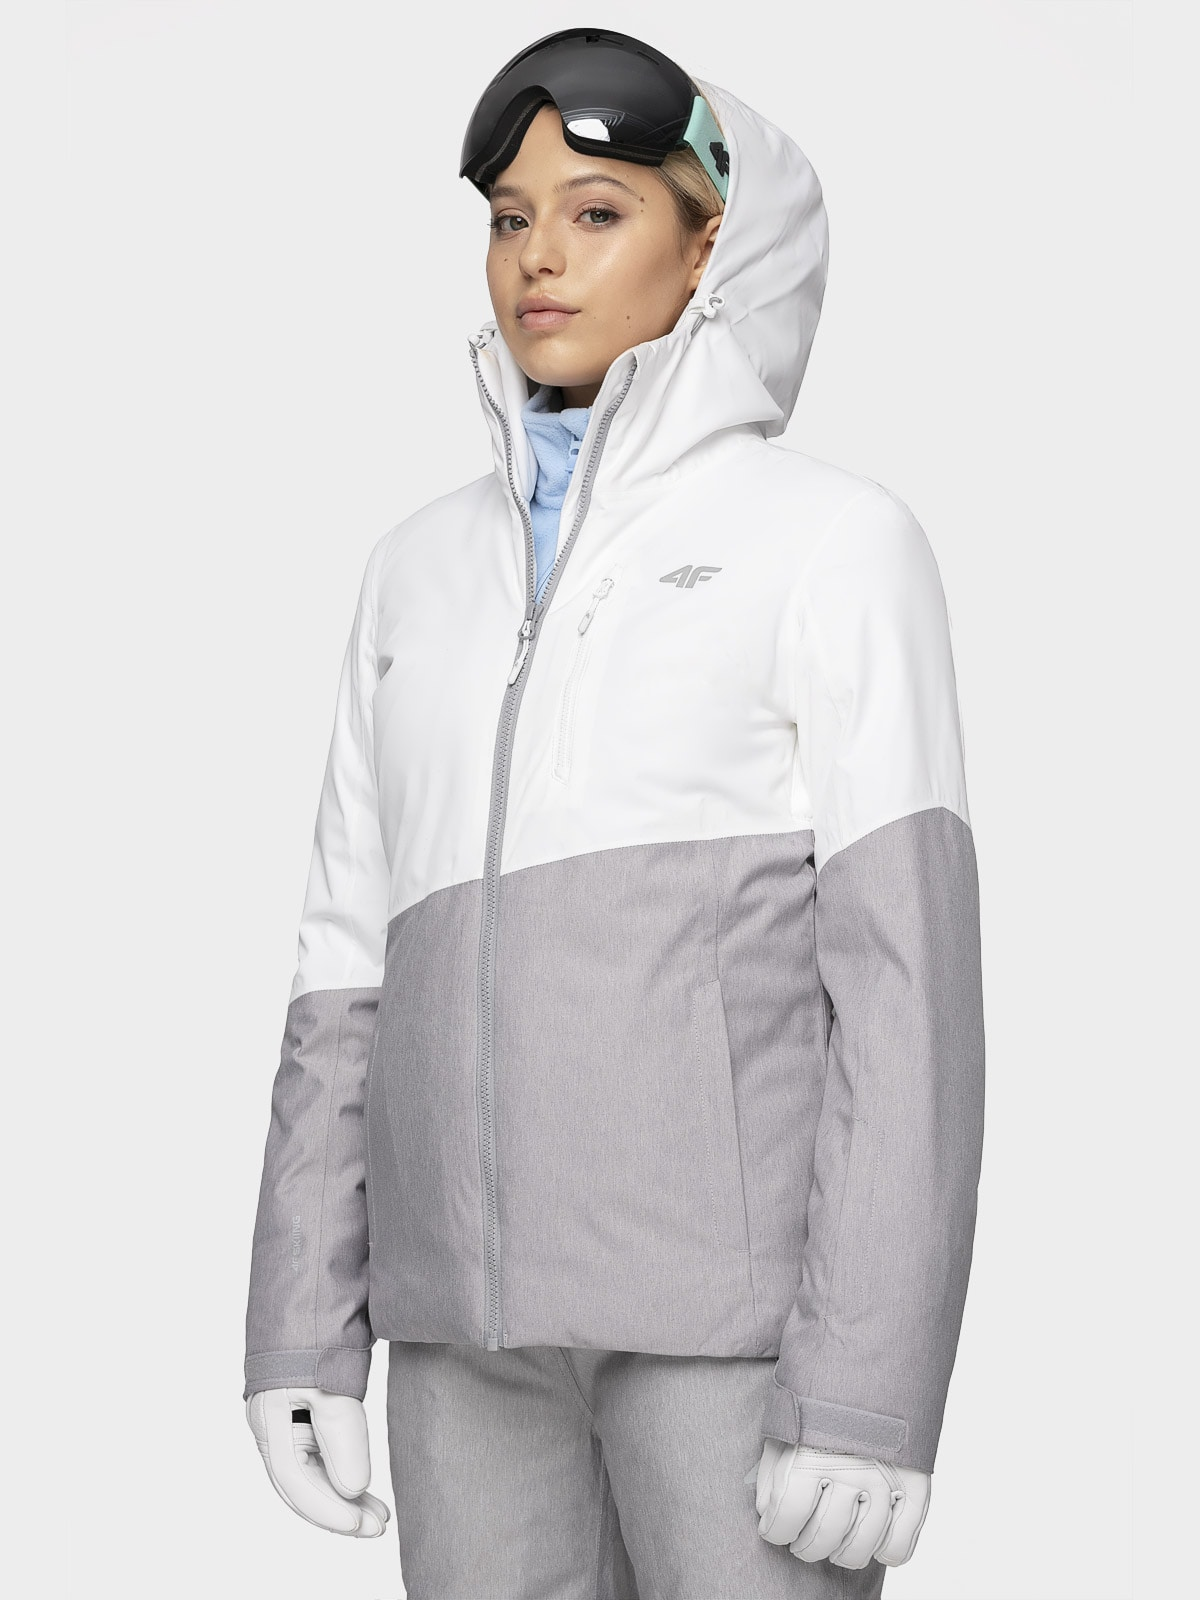 Kurtka narciarska damska KUDN303 - biały